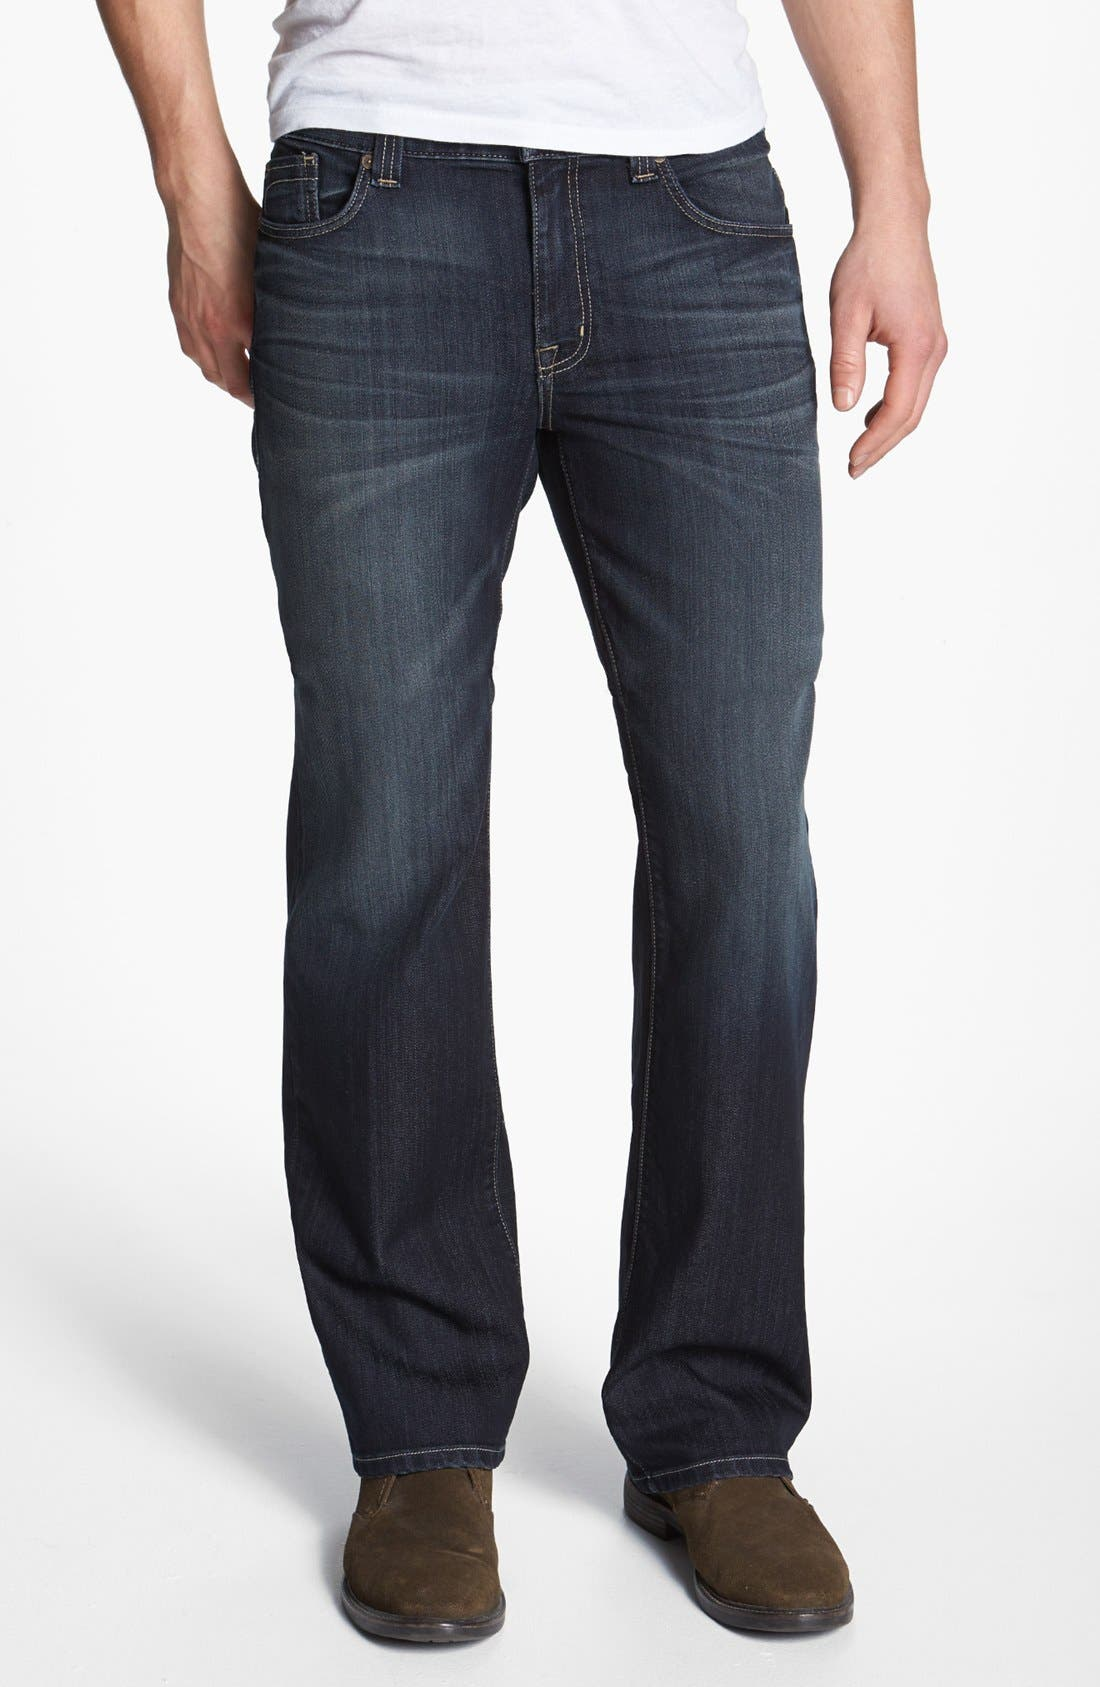 Alternate Image 1 Selected - Fidelity Denim 'Camino' Relaxed Leg Jeans (Trigger Marx)